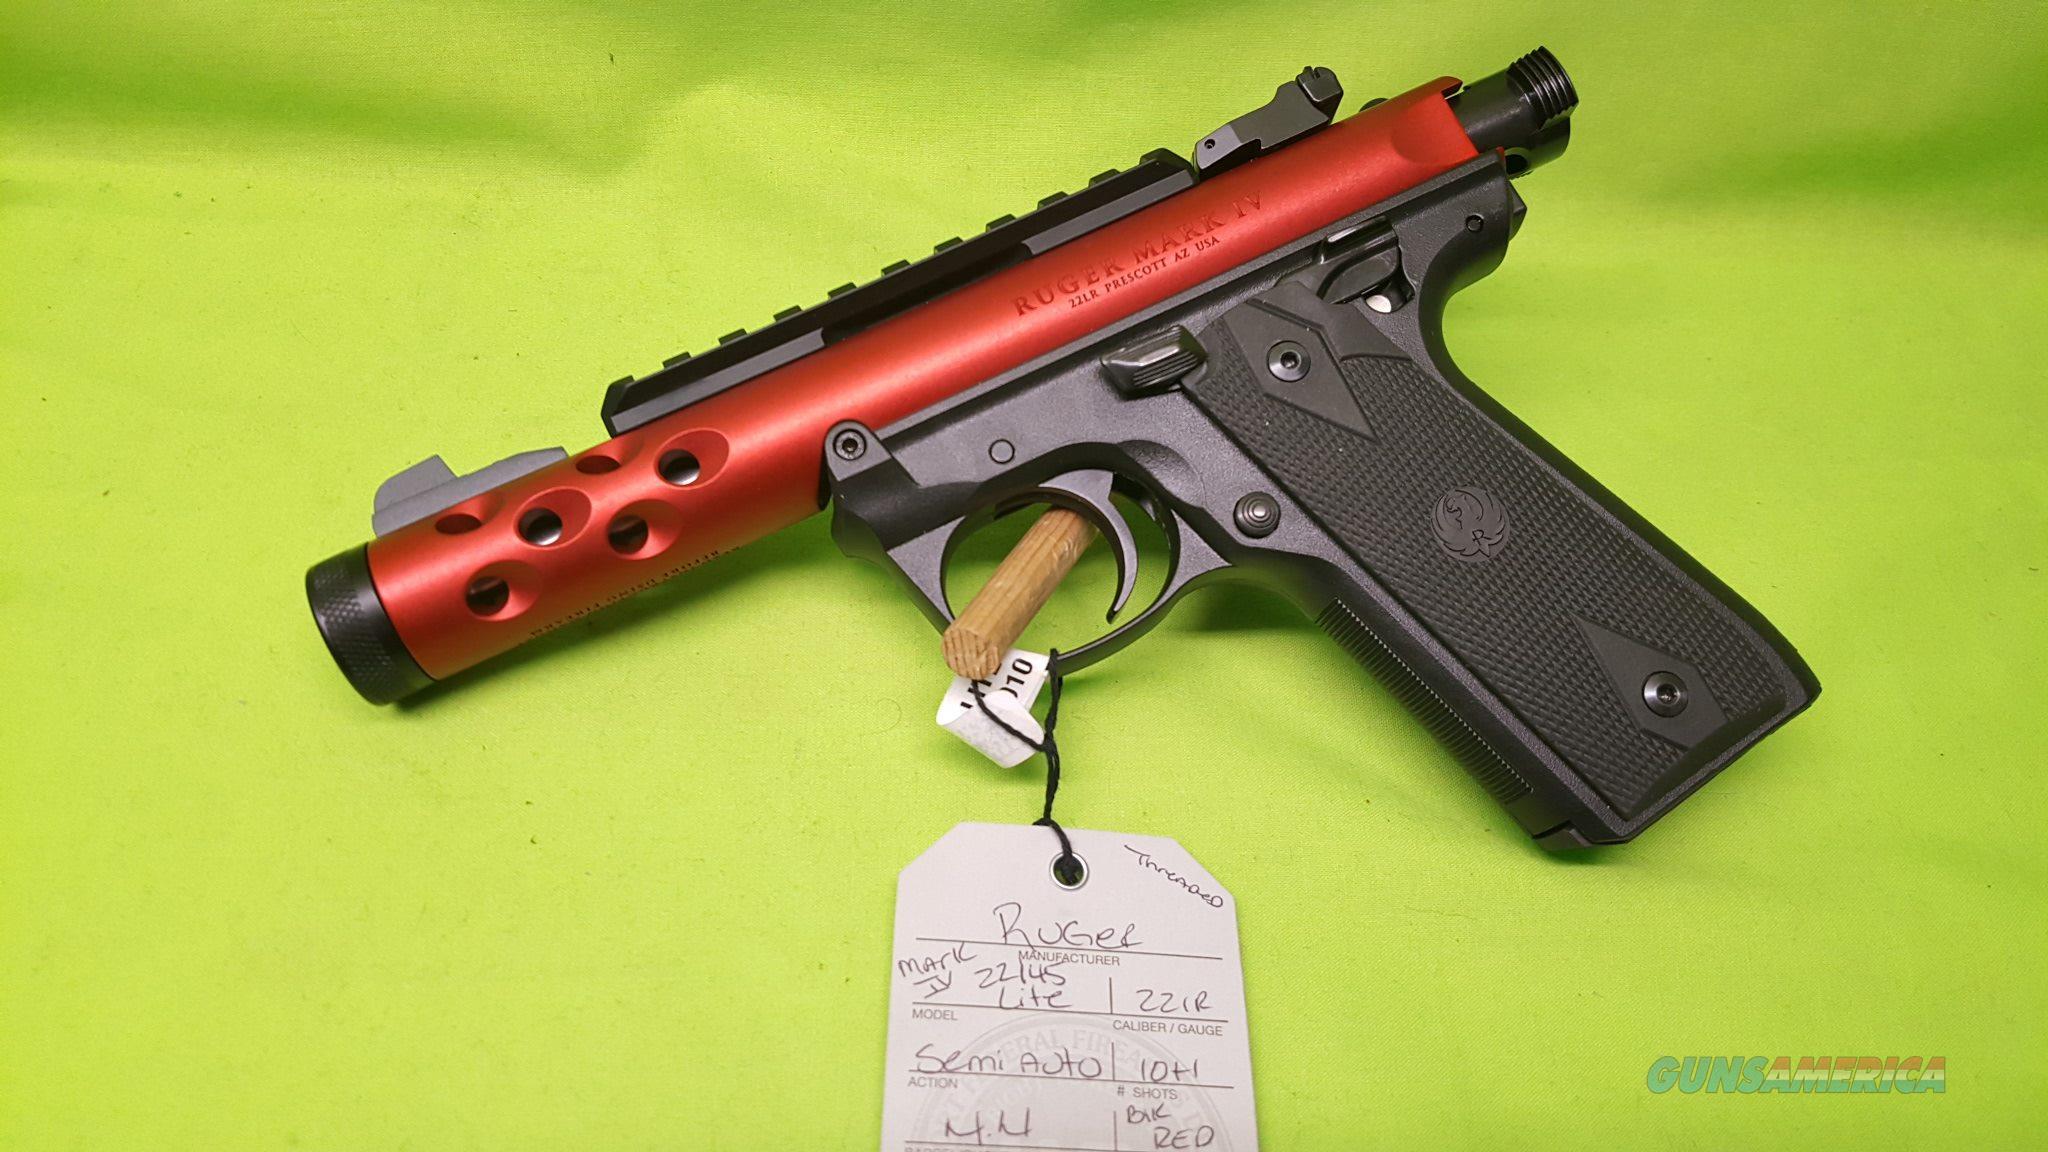 RUGER MARK IV 22 45 22/45 LITE 22LR RED 43910 POST RECALL  Guns > Pistols > Ruger Semi-Auto Pistols > 22/45